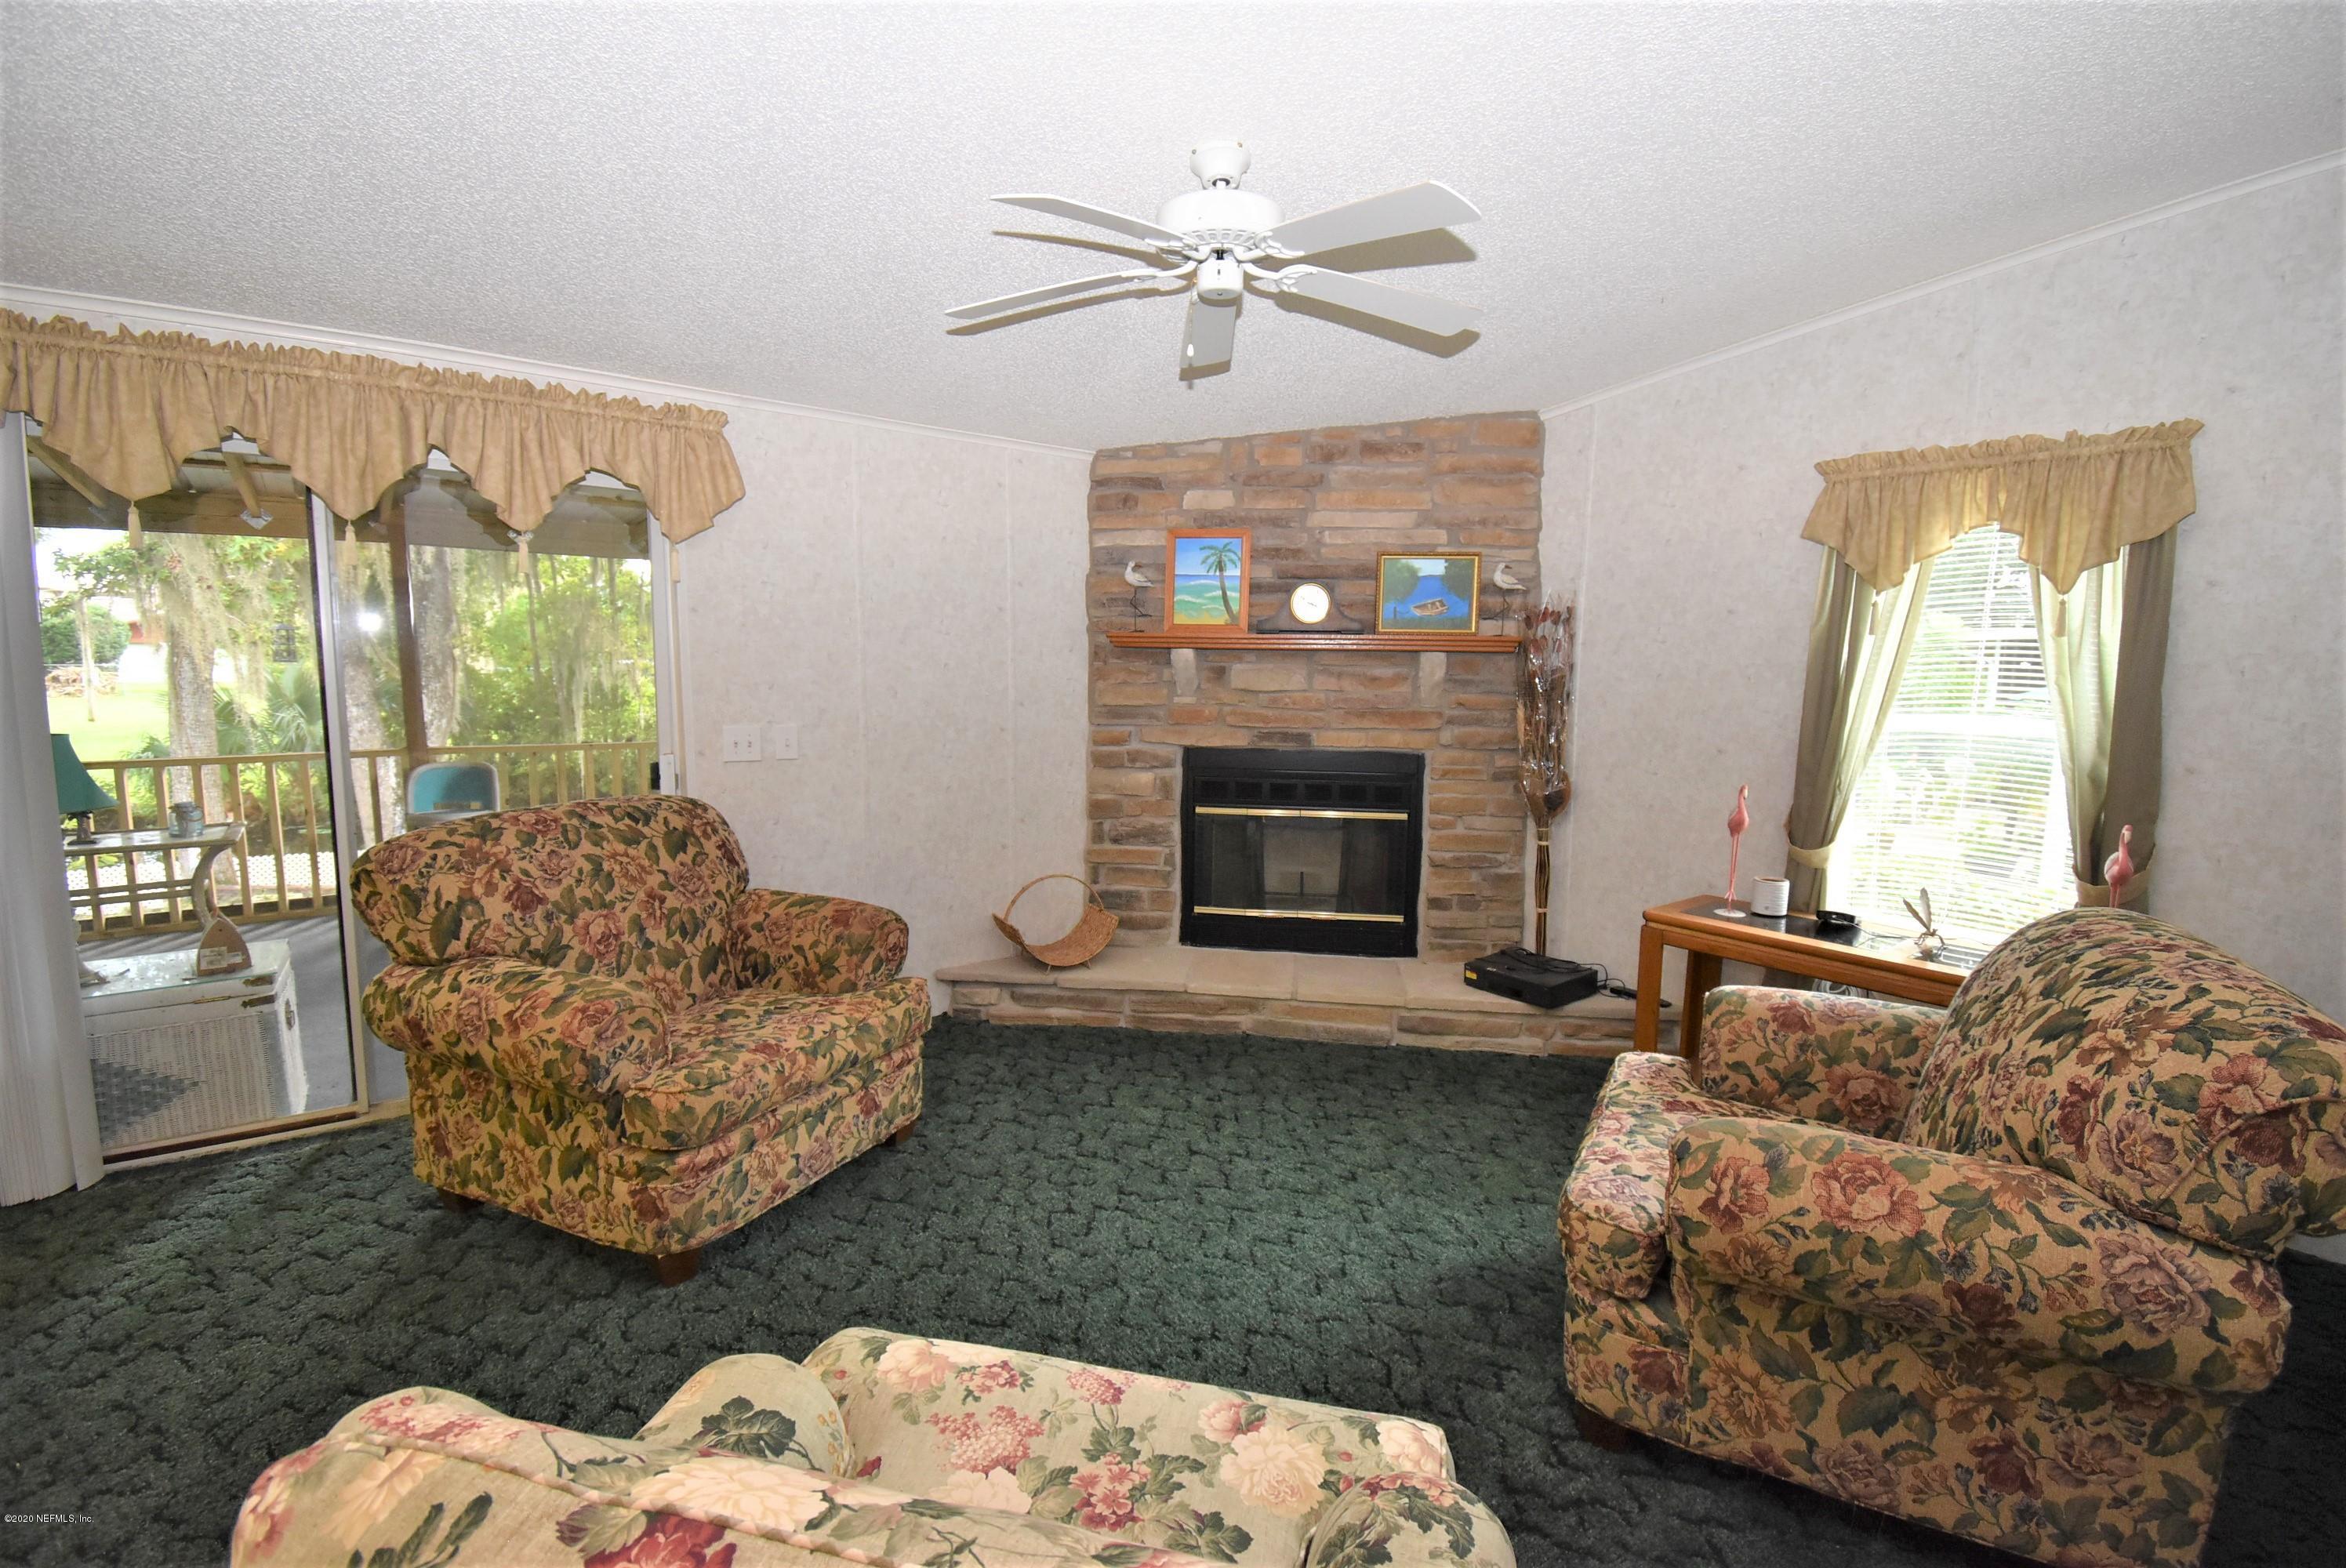 179 KOLSKI, CRESCENT CITY, FLORIDA 32112, 3 Bedrooms Bedrooms, ,2 BathroomsBathrooms,Residential,For sale,KOLSKI,1076095